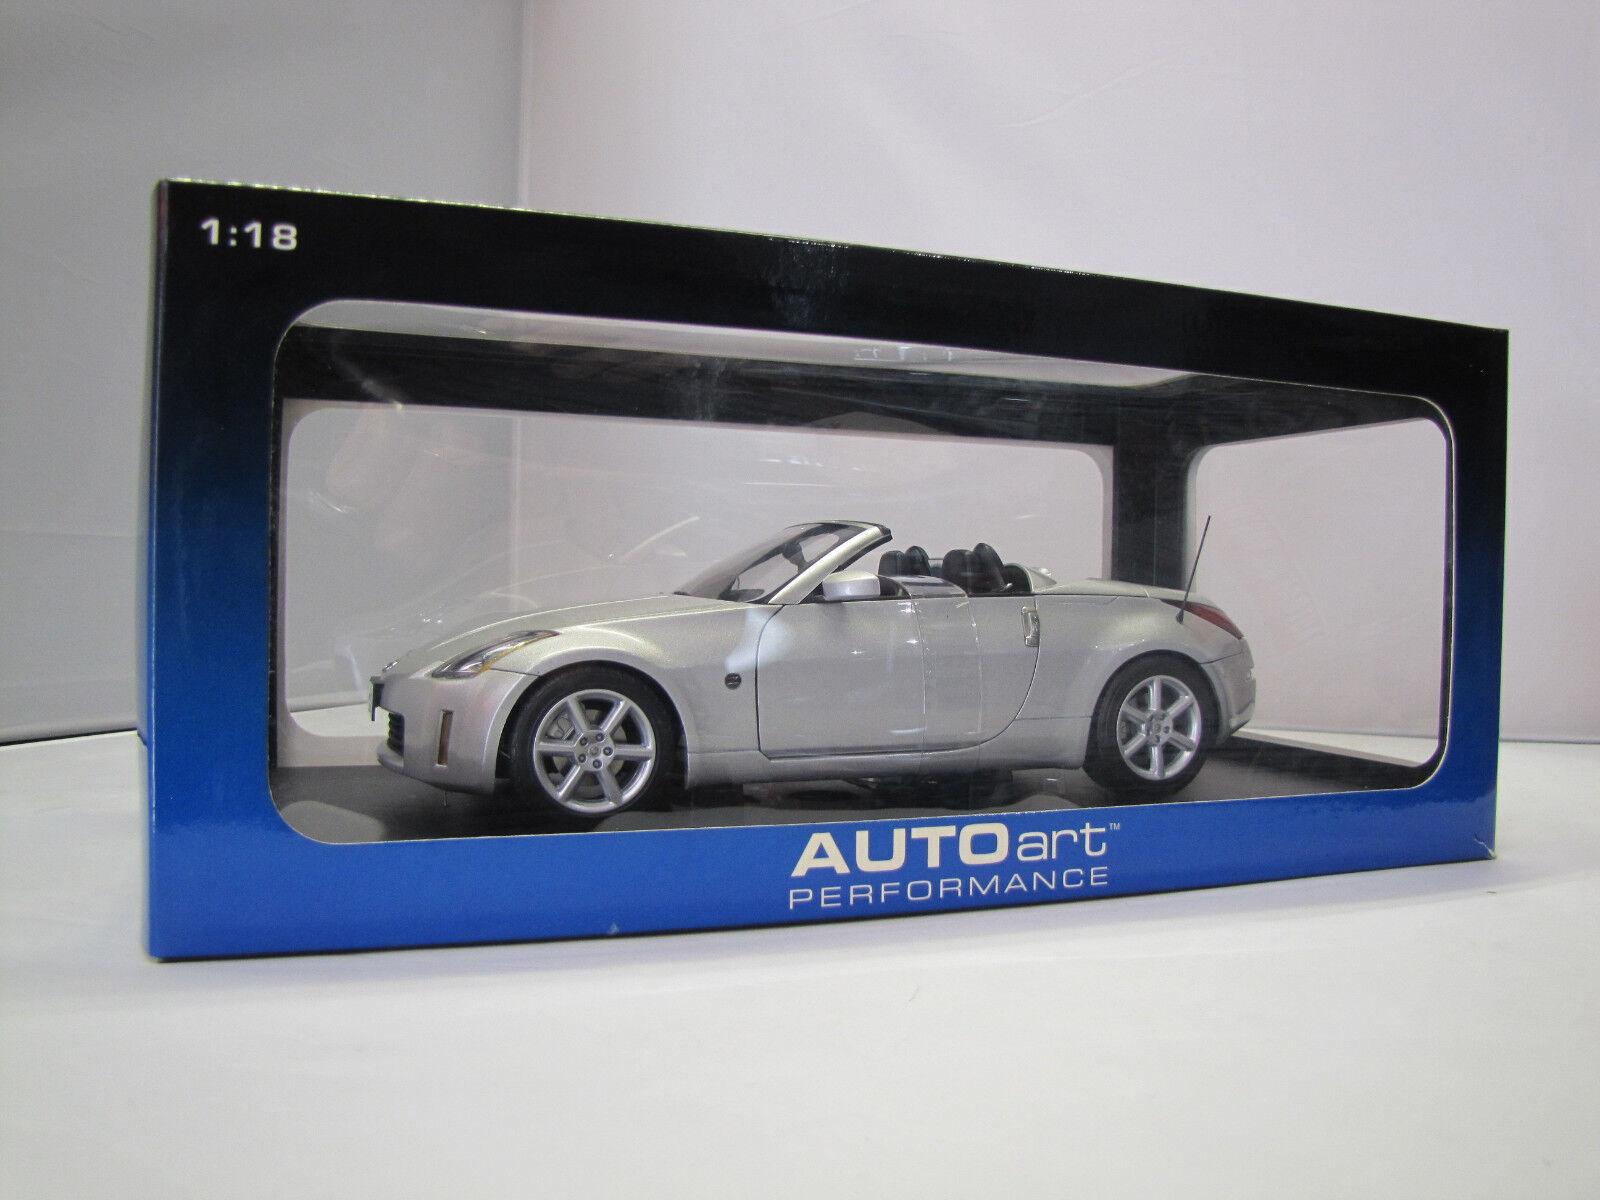 77371 Autoart Nissan 350 Z Roadster (Diamond Argento) - 1:18